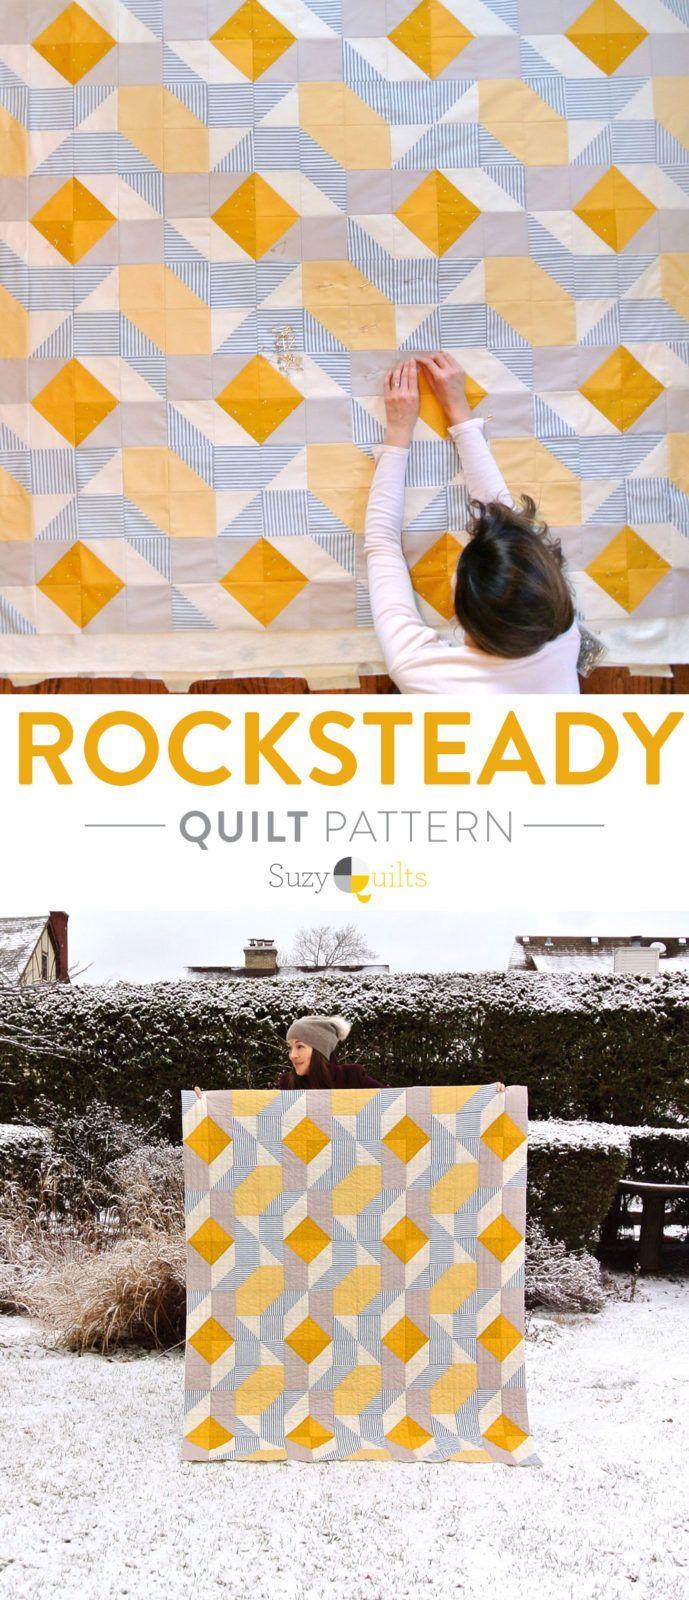 Rocksteady Quilt Pattern A Bright Corner